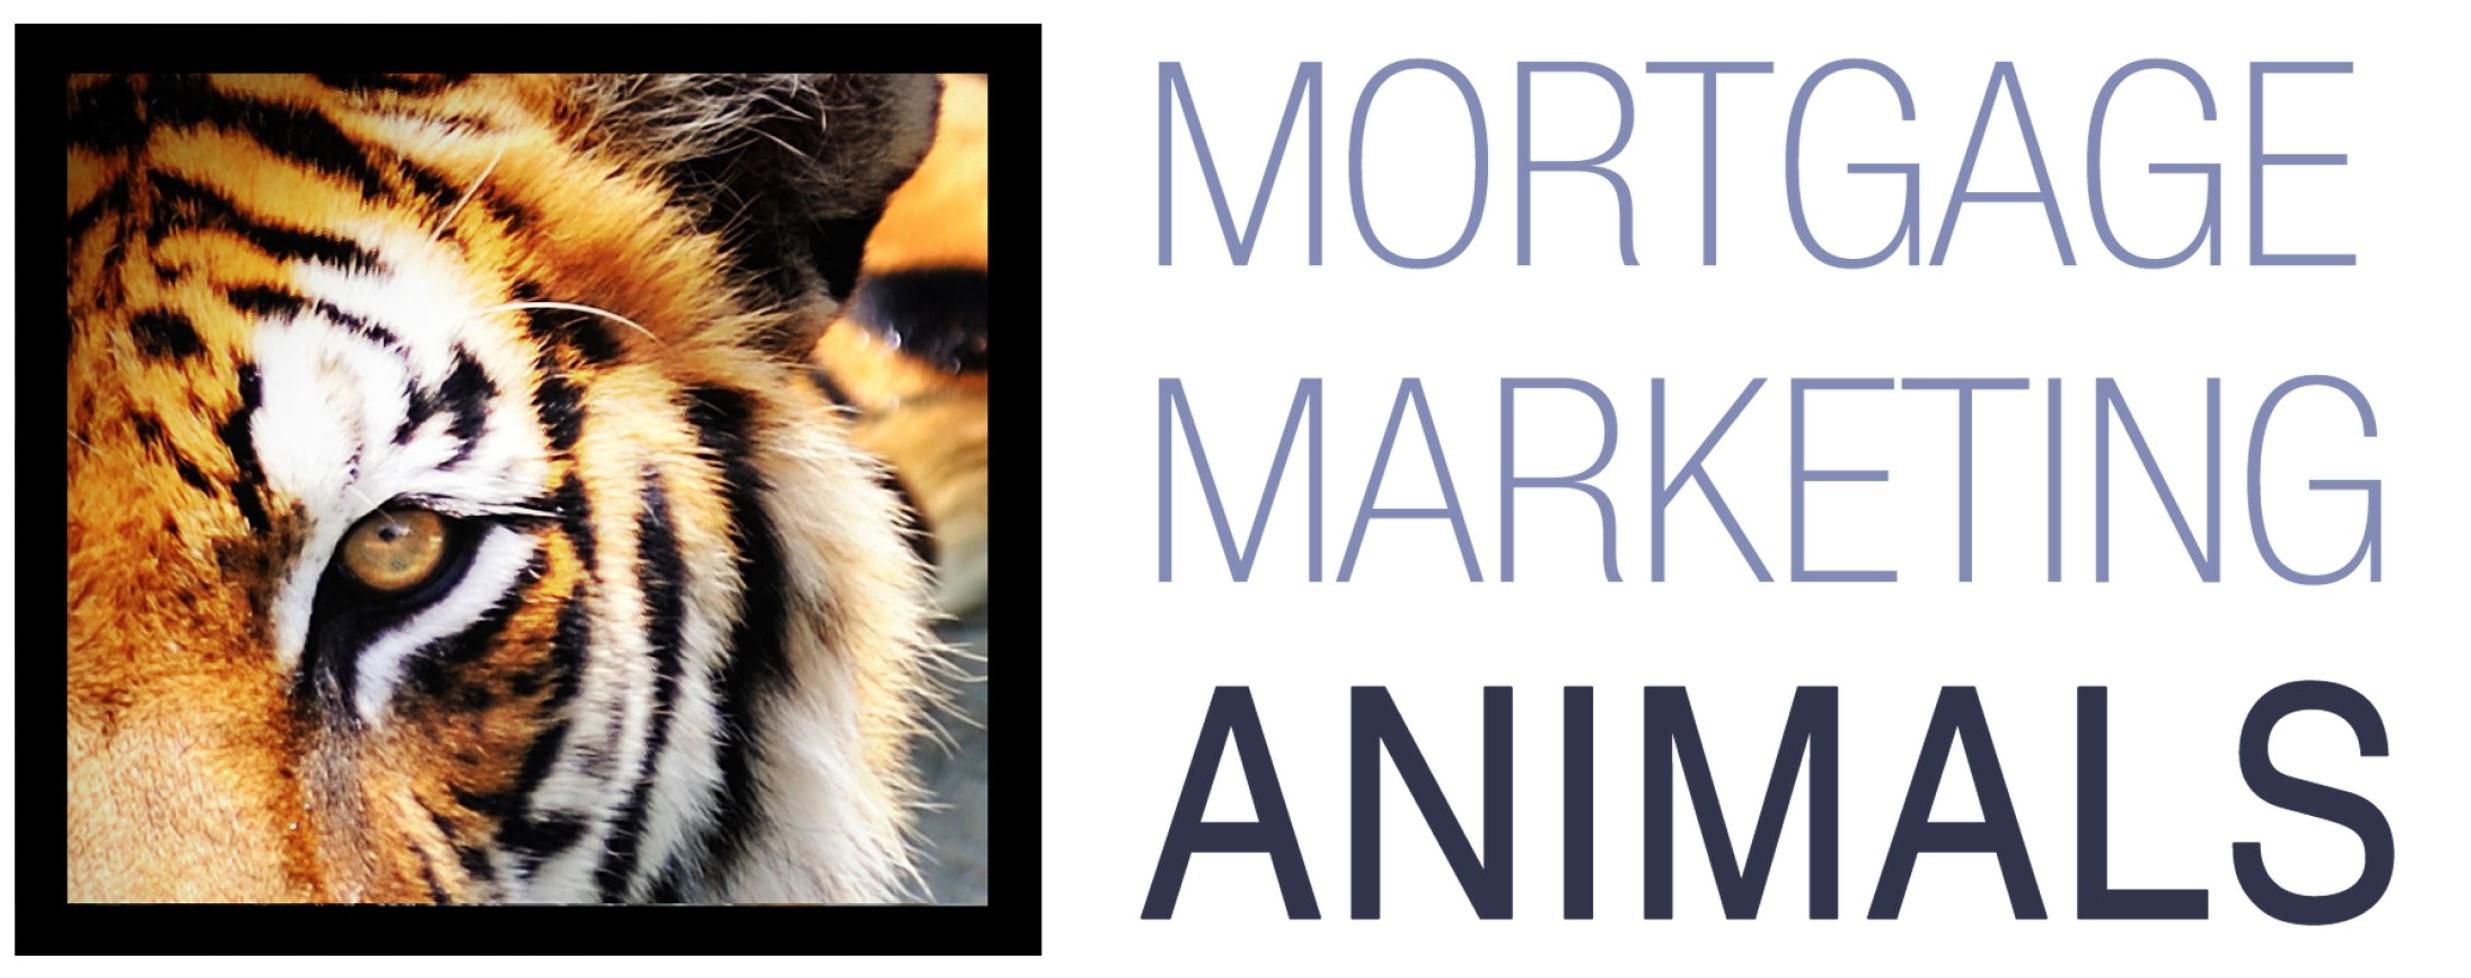 mortgage marketing animals logo